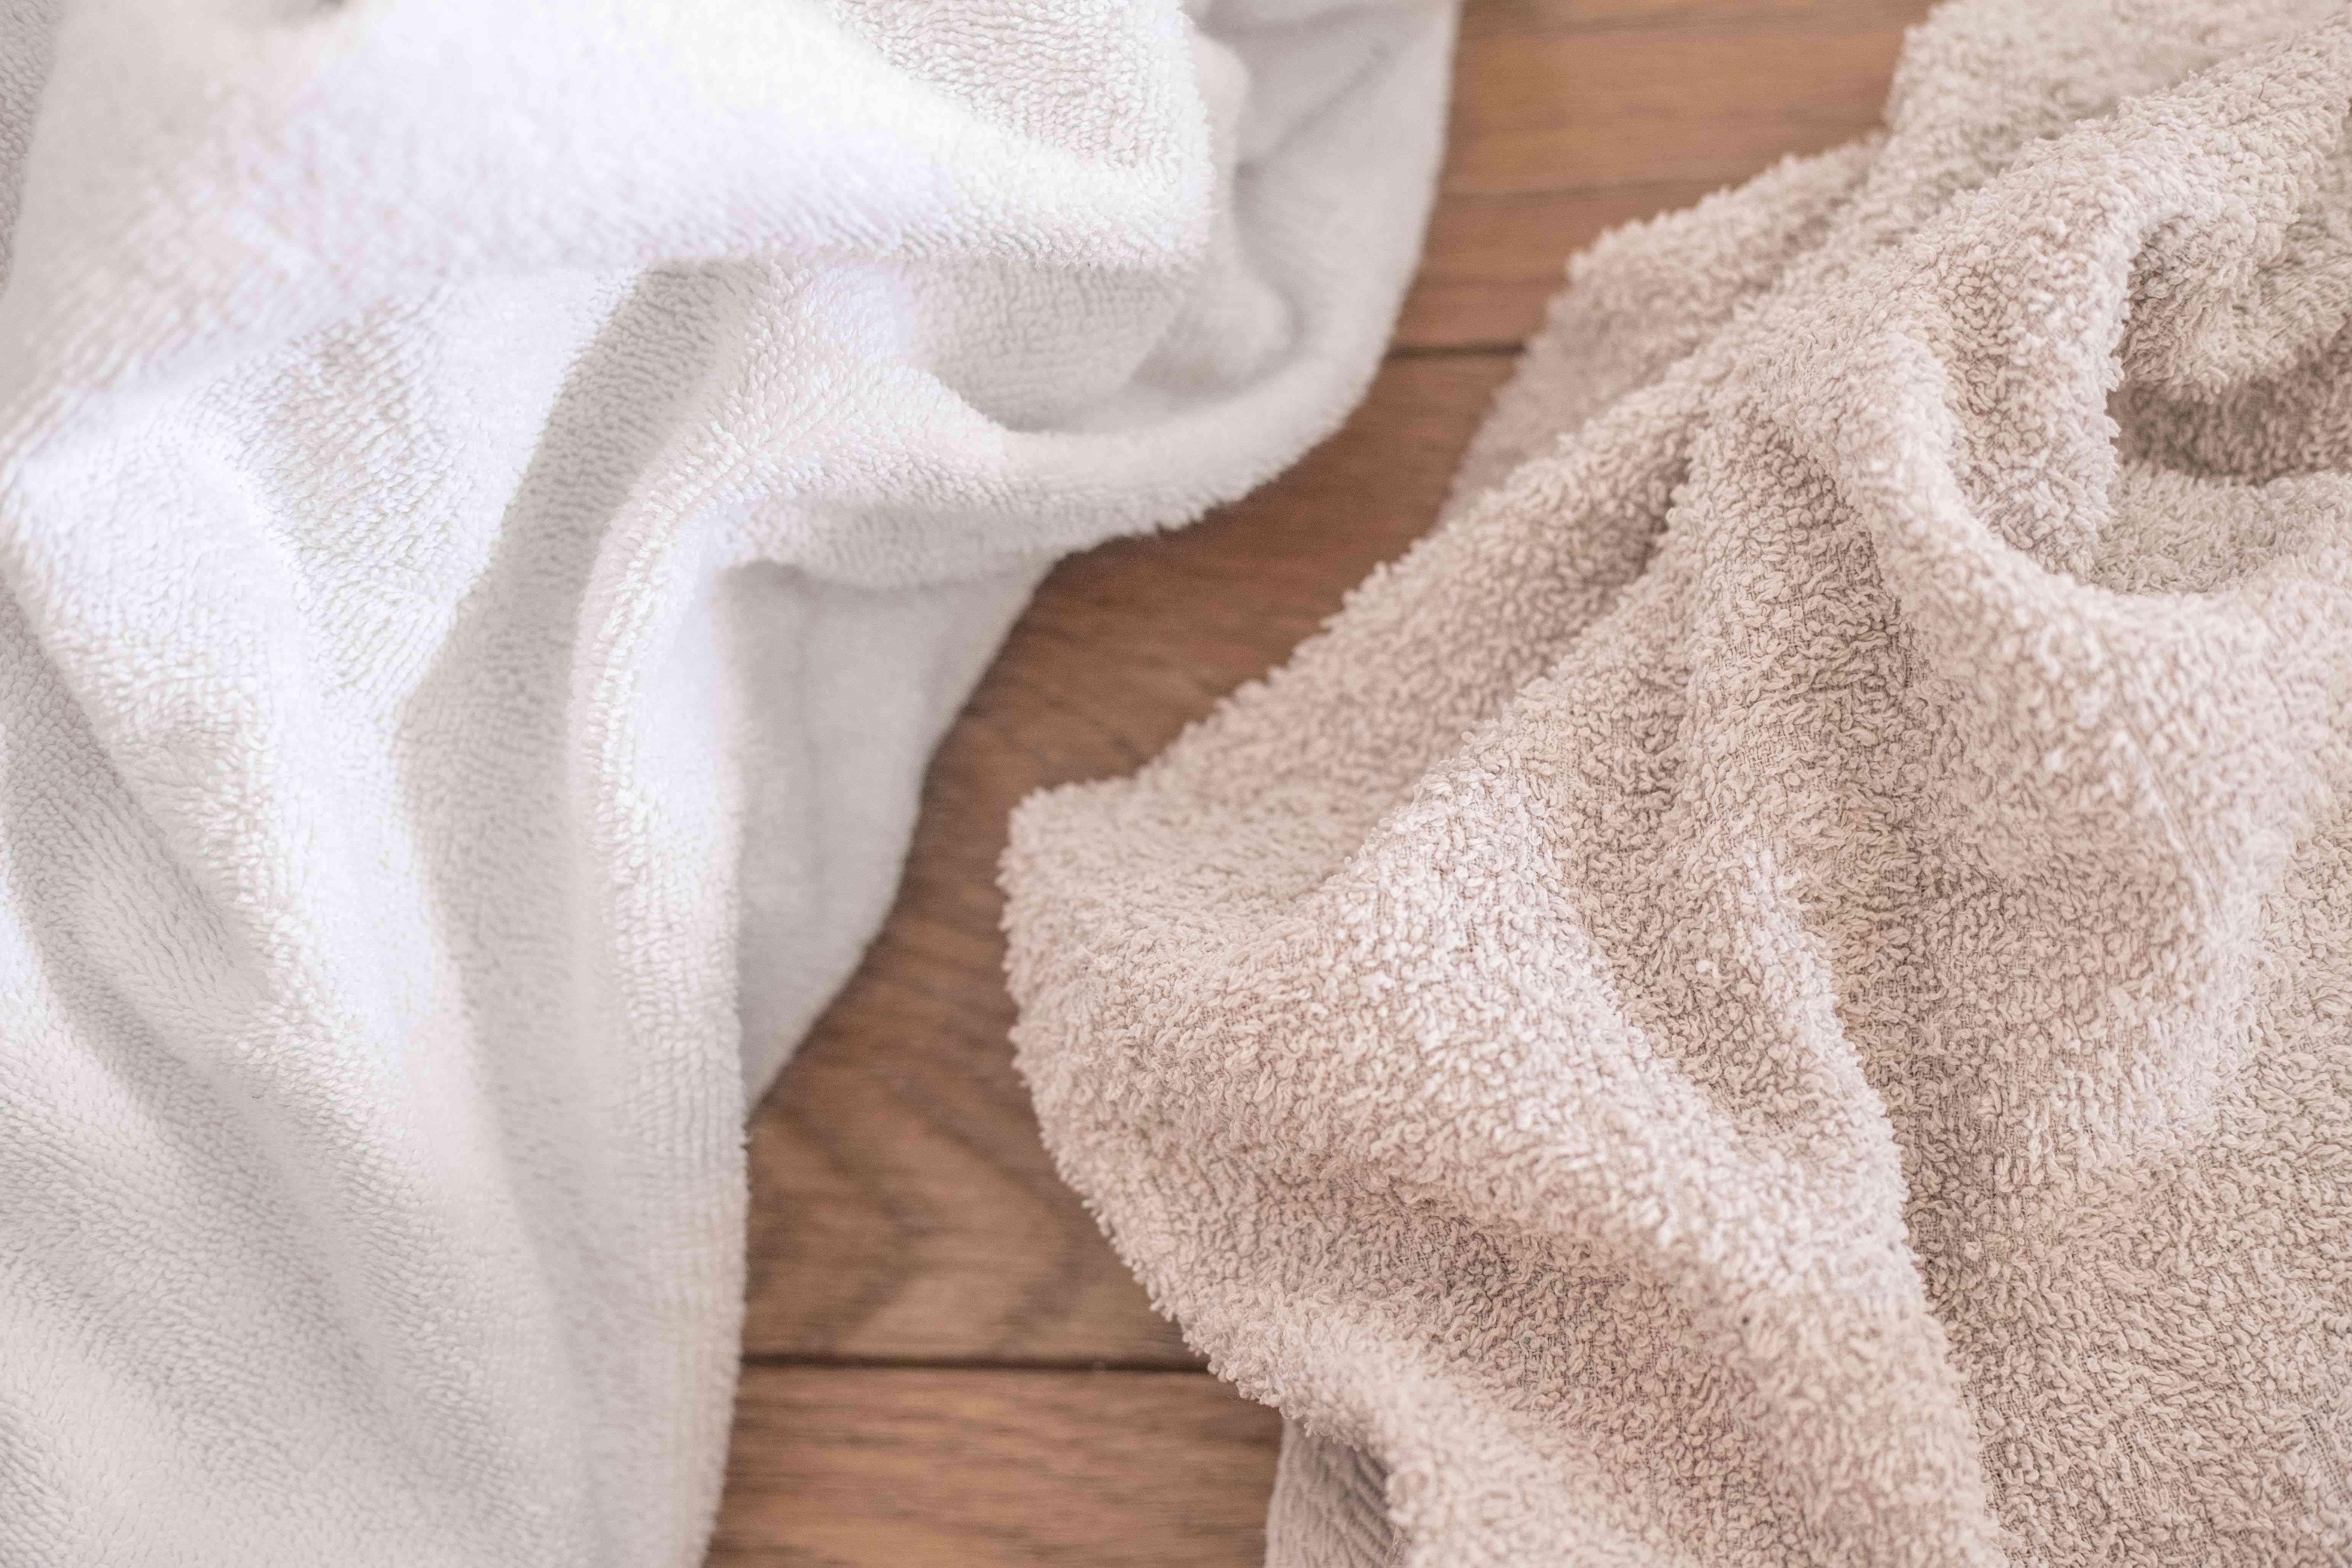 up close fluffy towels